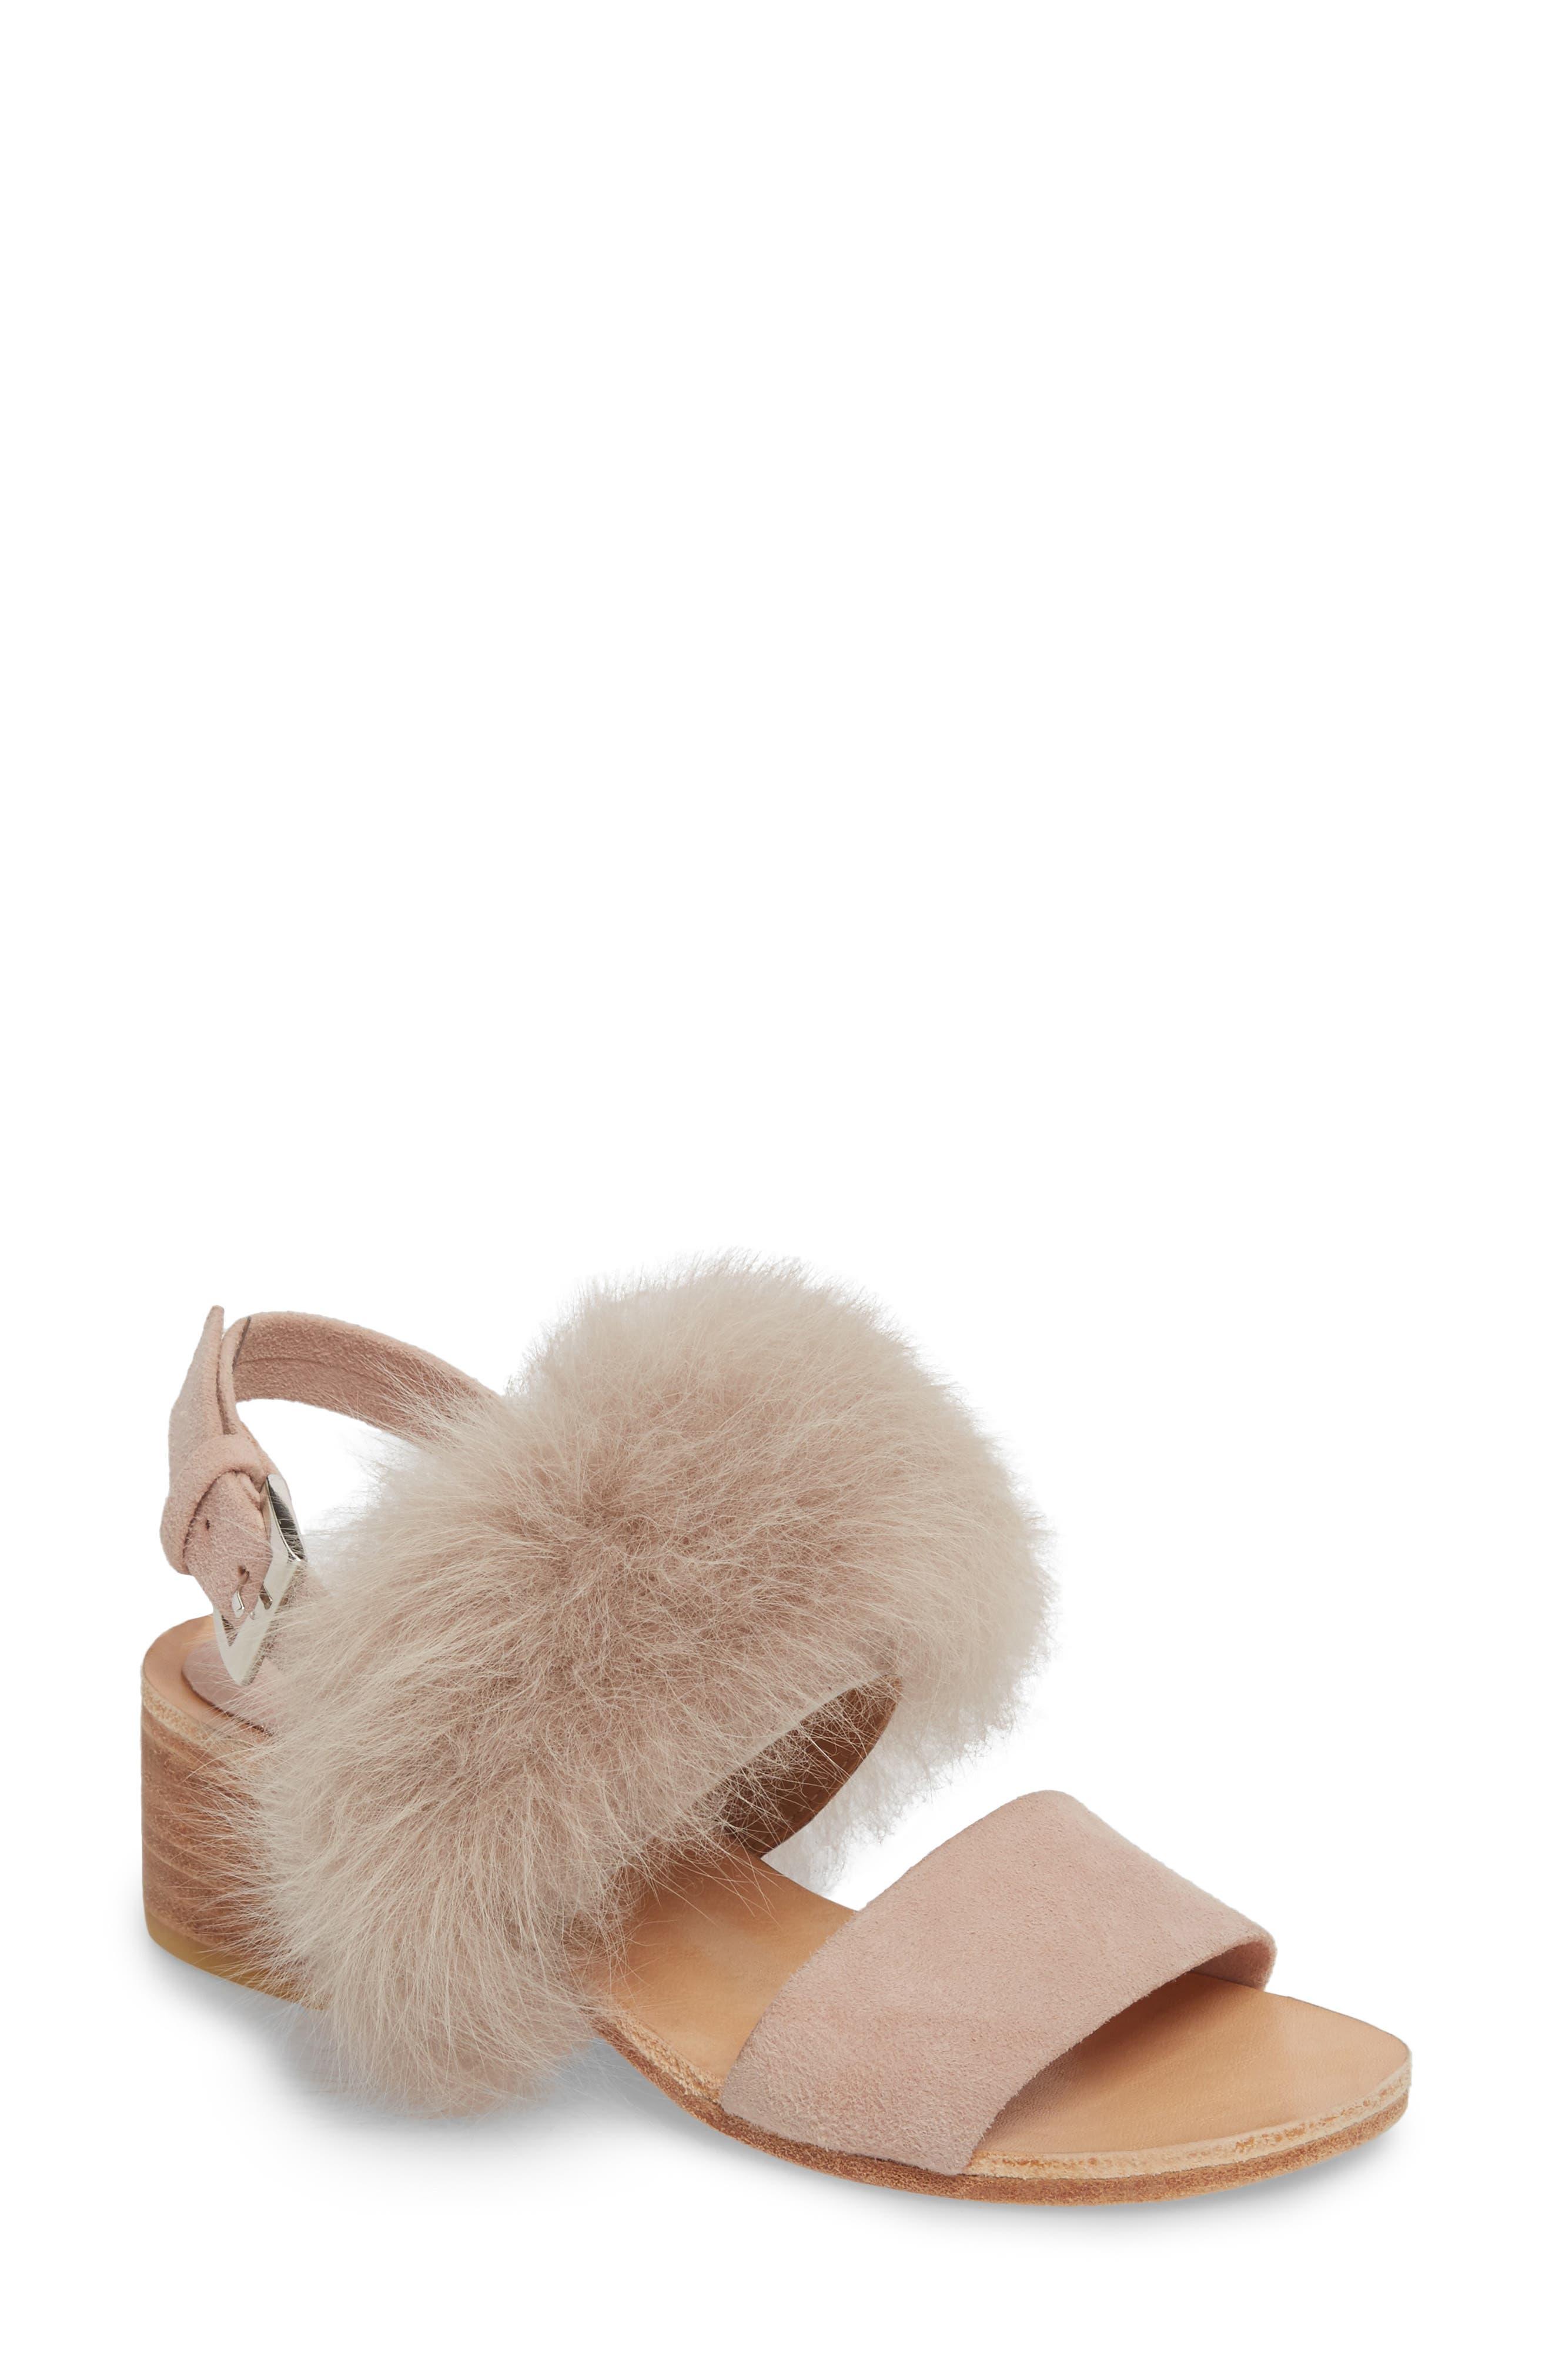 Huma Blanco Clemence Genuine Alpaca Fur Sandal, Pink